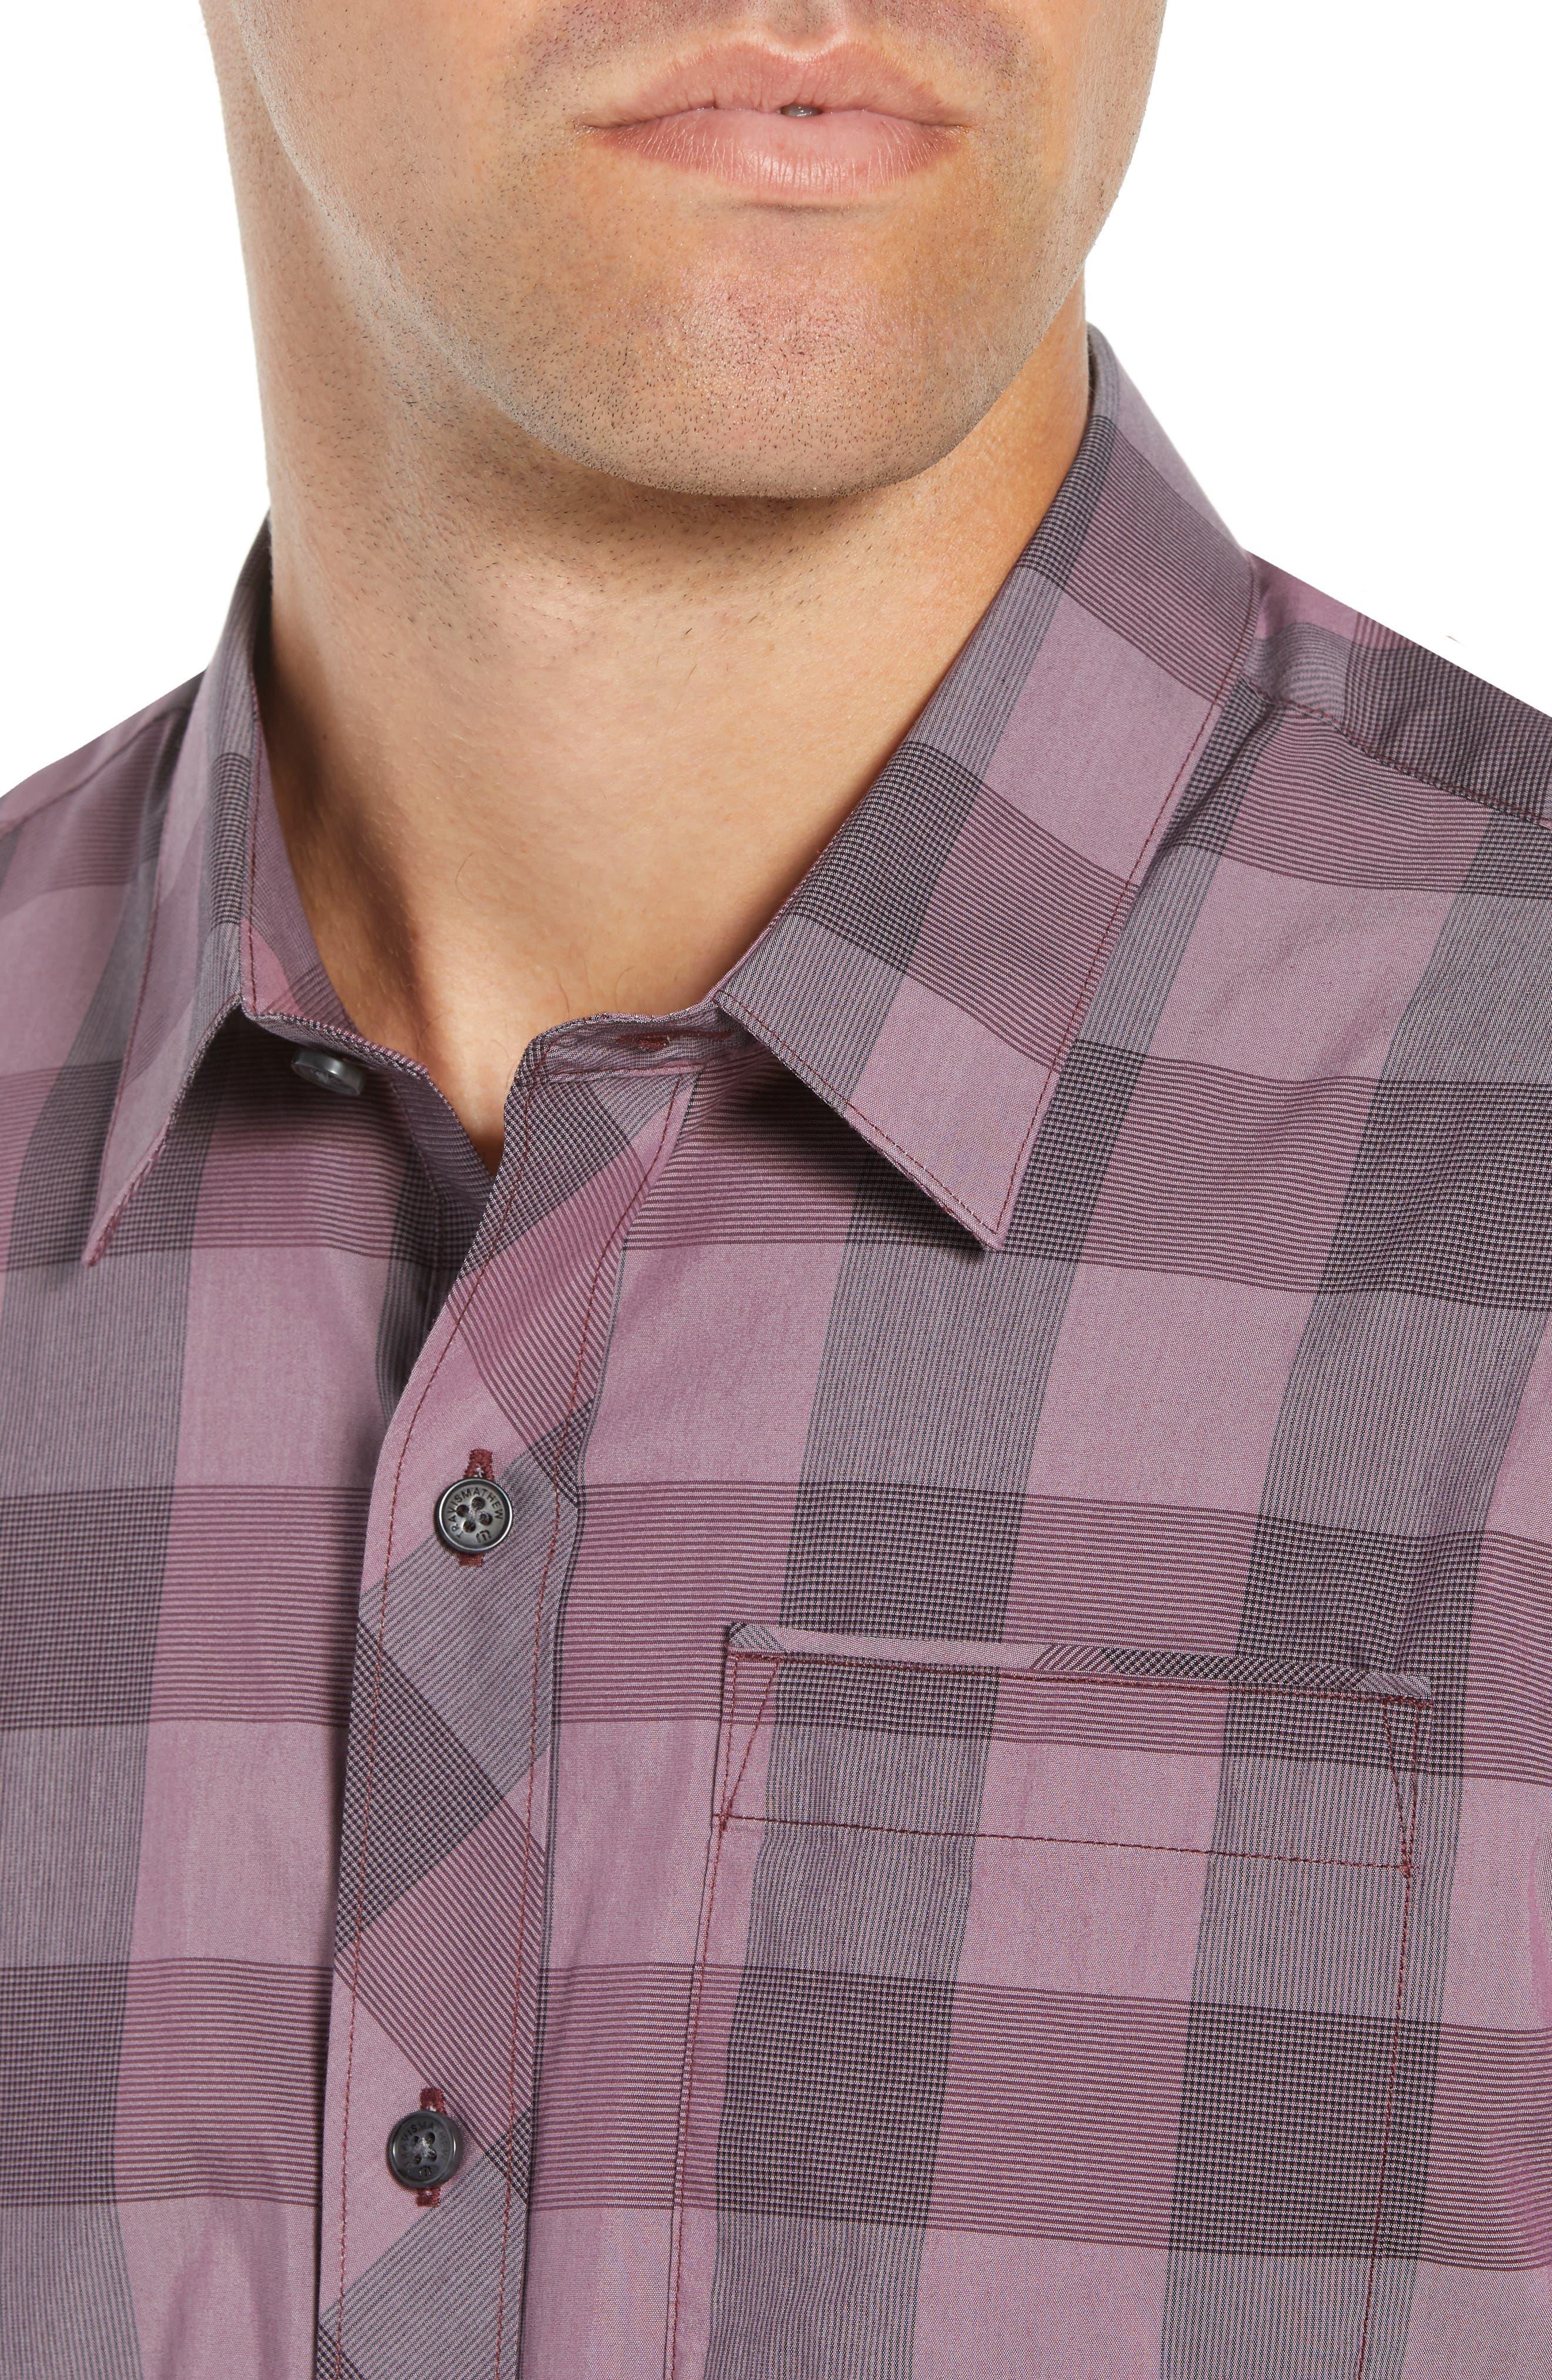 Buffalo Regular Fit Sport Shirt,                             Alternate thumbnail 2, color,                             HEATHER EGGPLANT